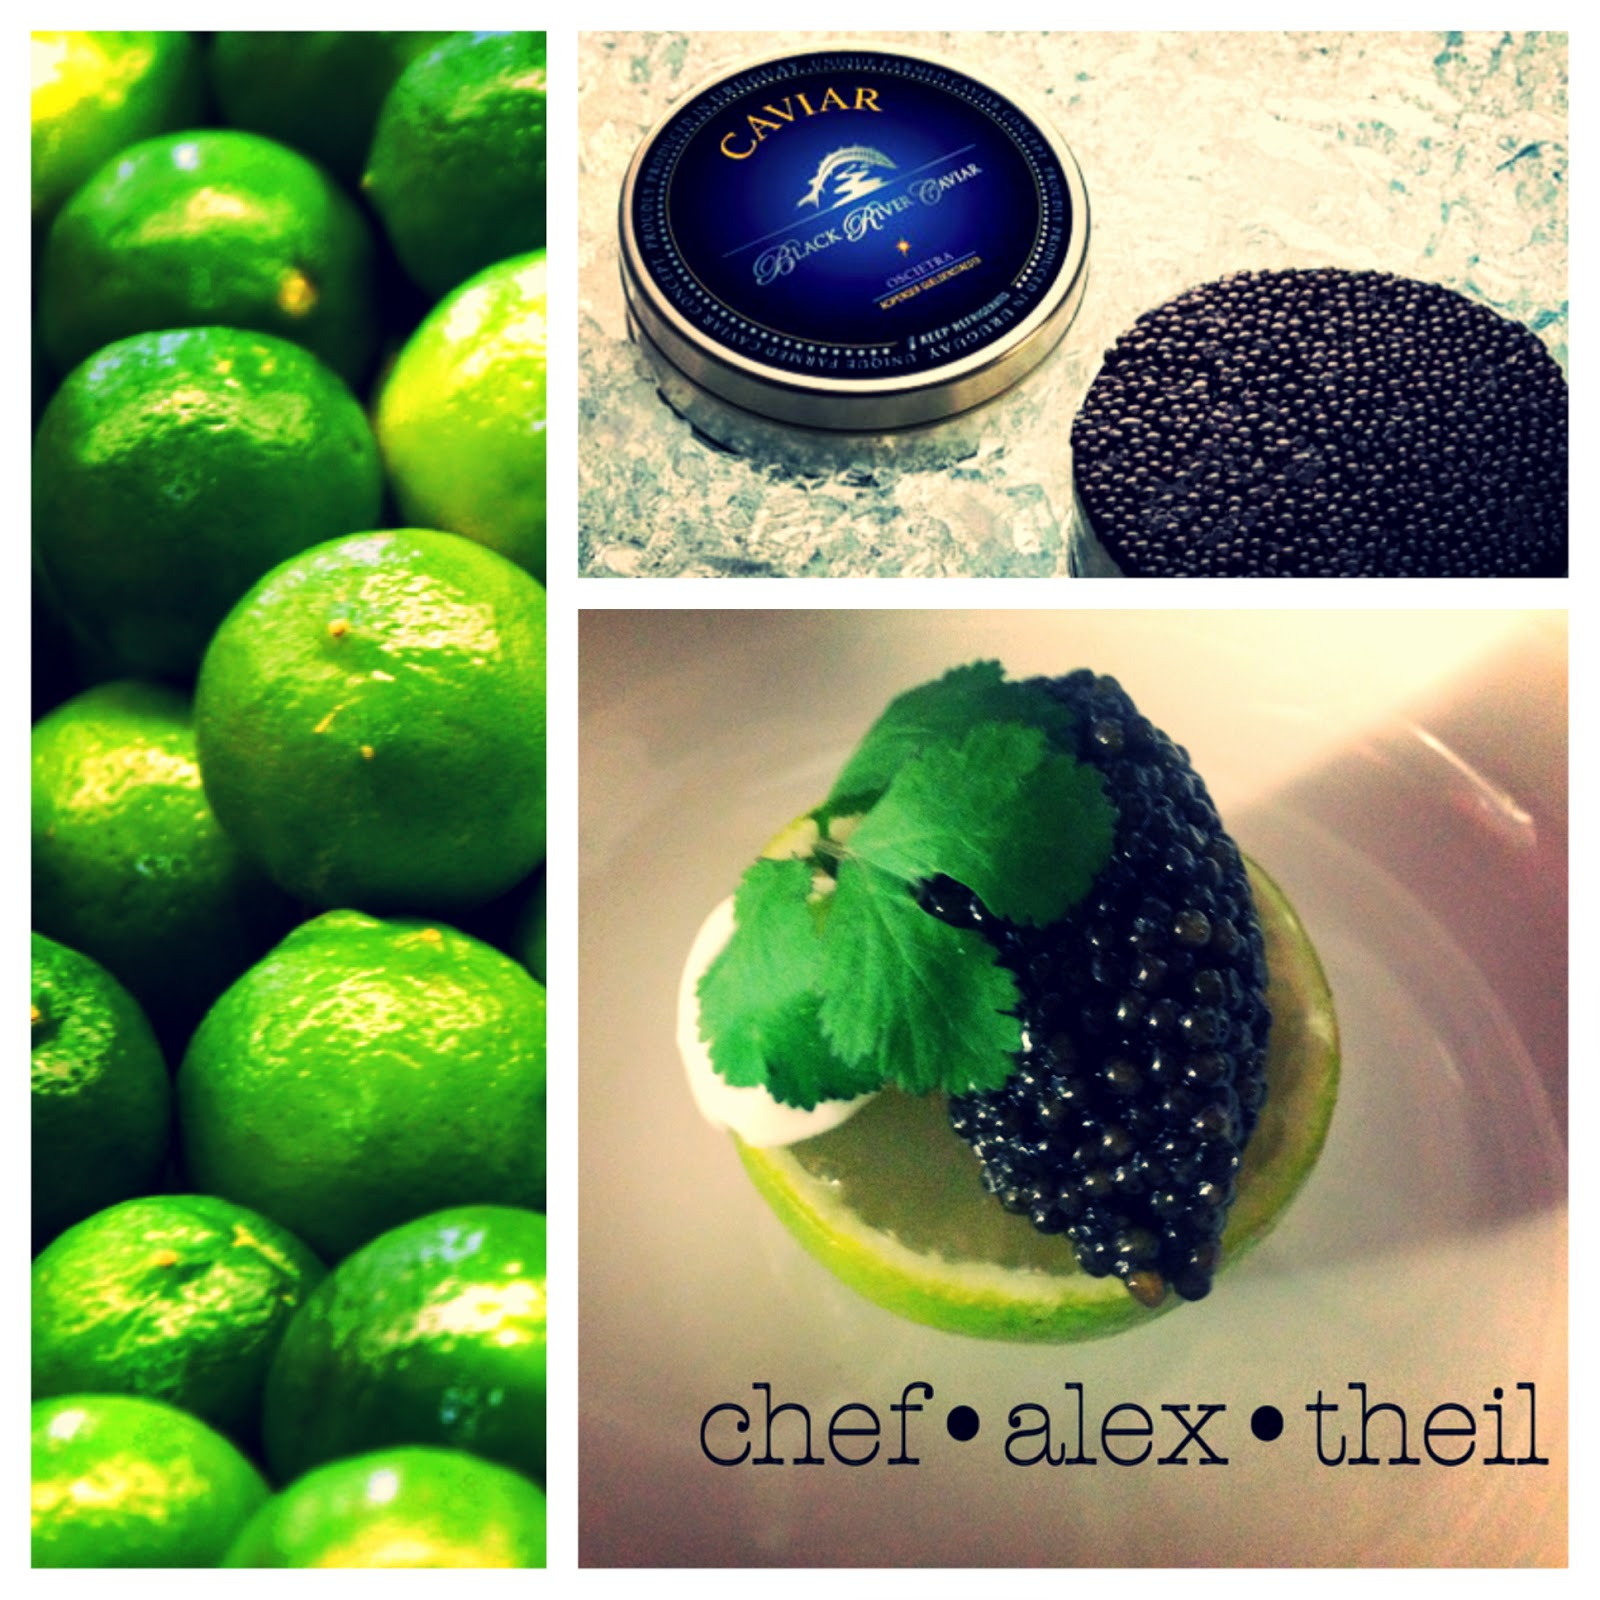 Chef Alex Theil Partner von Klaus Piber Mercado Latin Inspired Market Cuisine Wien Stubenring 18 09 Caviar unze gramm Uruguay Limette Crema Agria Koriander Osetra Citrus